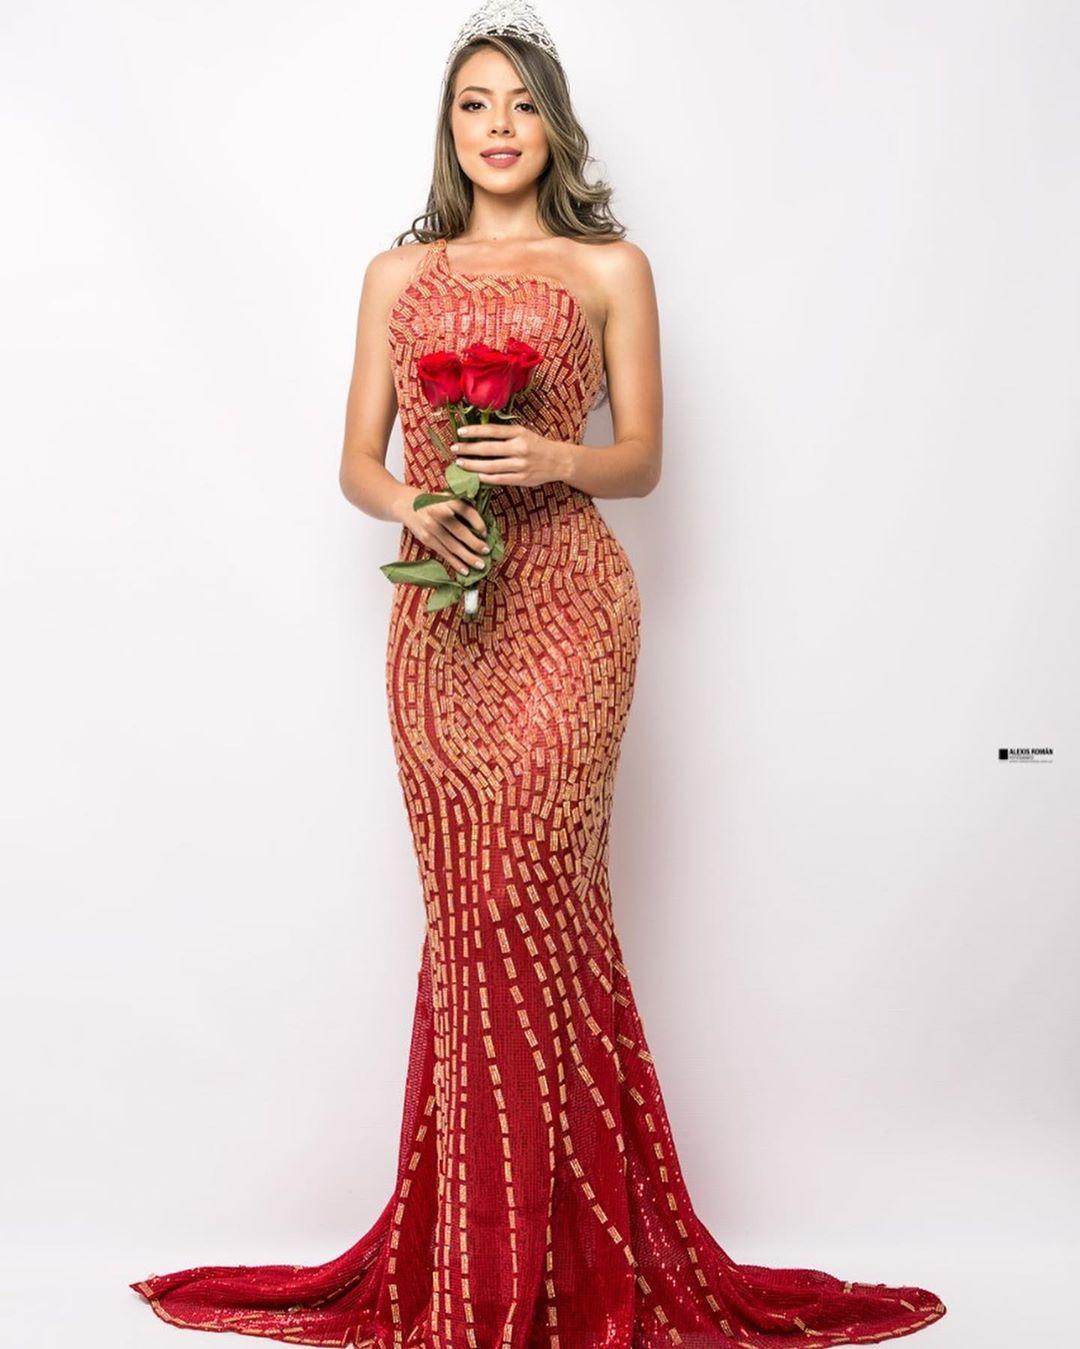 gina aguirre, virreyna de miss latinoamerica 2019. - Página 3 66613810